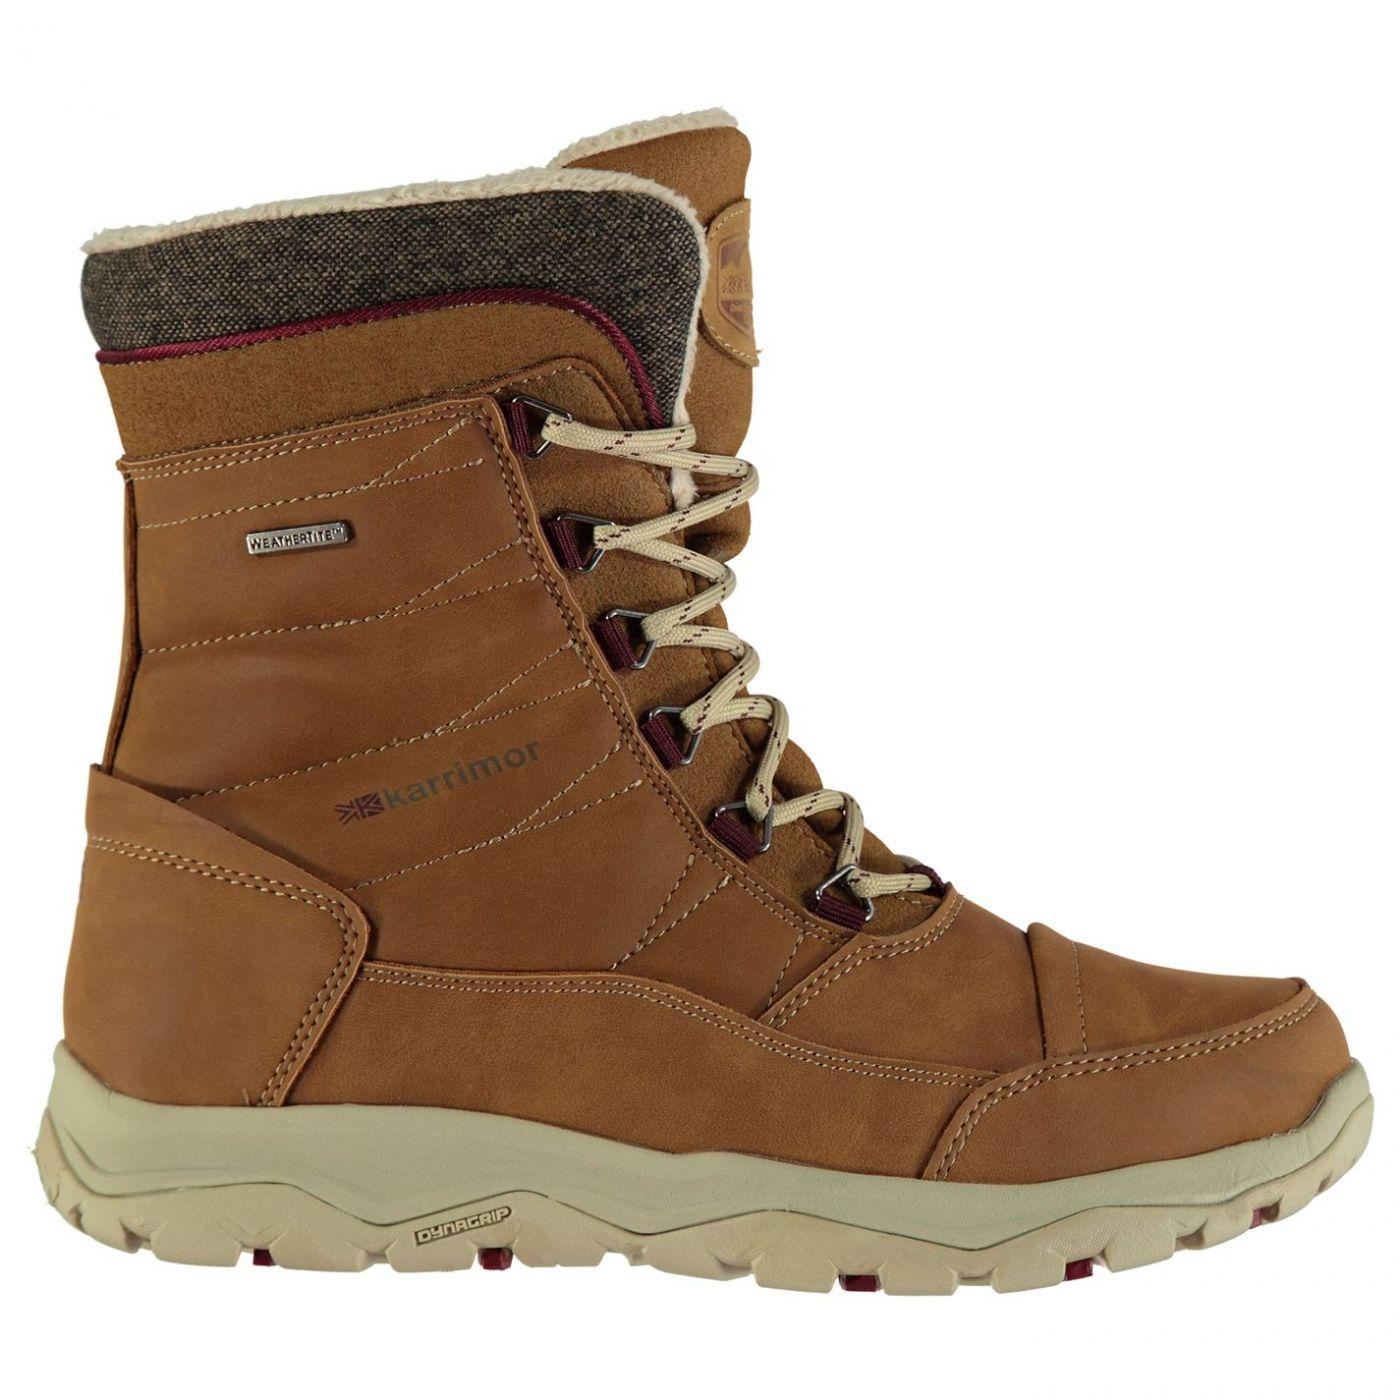 Karrimor Ranger Ladies Snow Boots